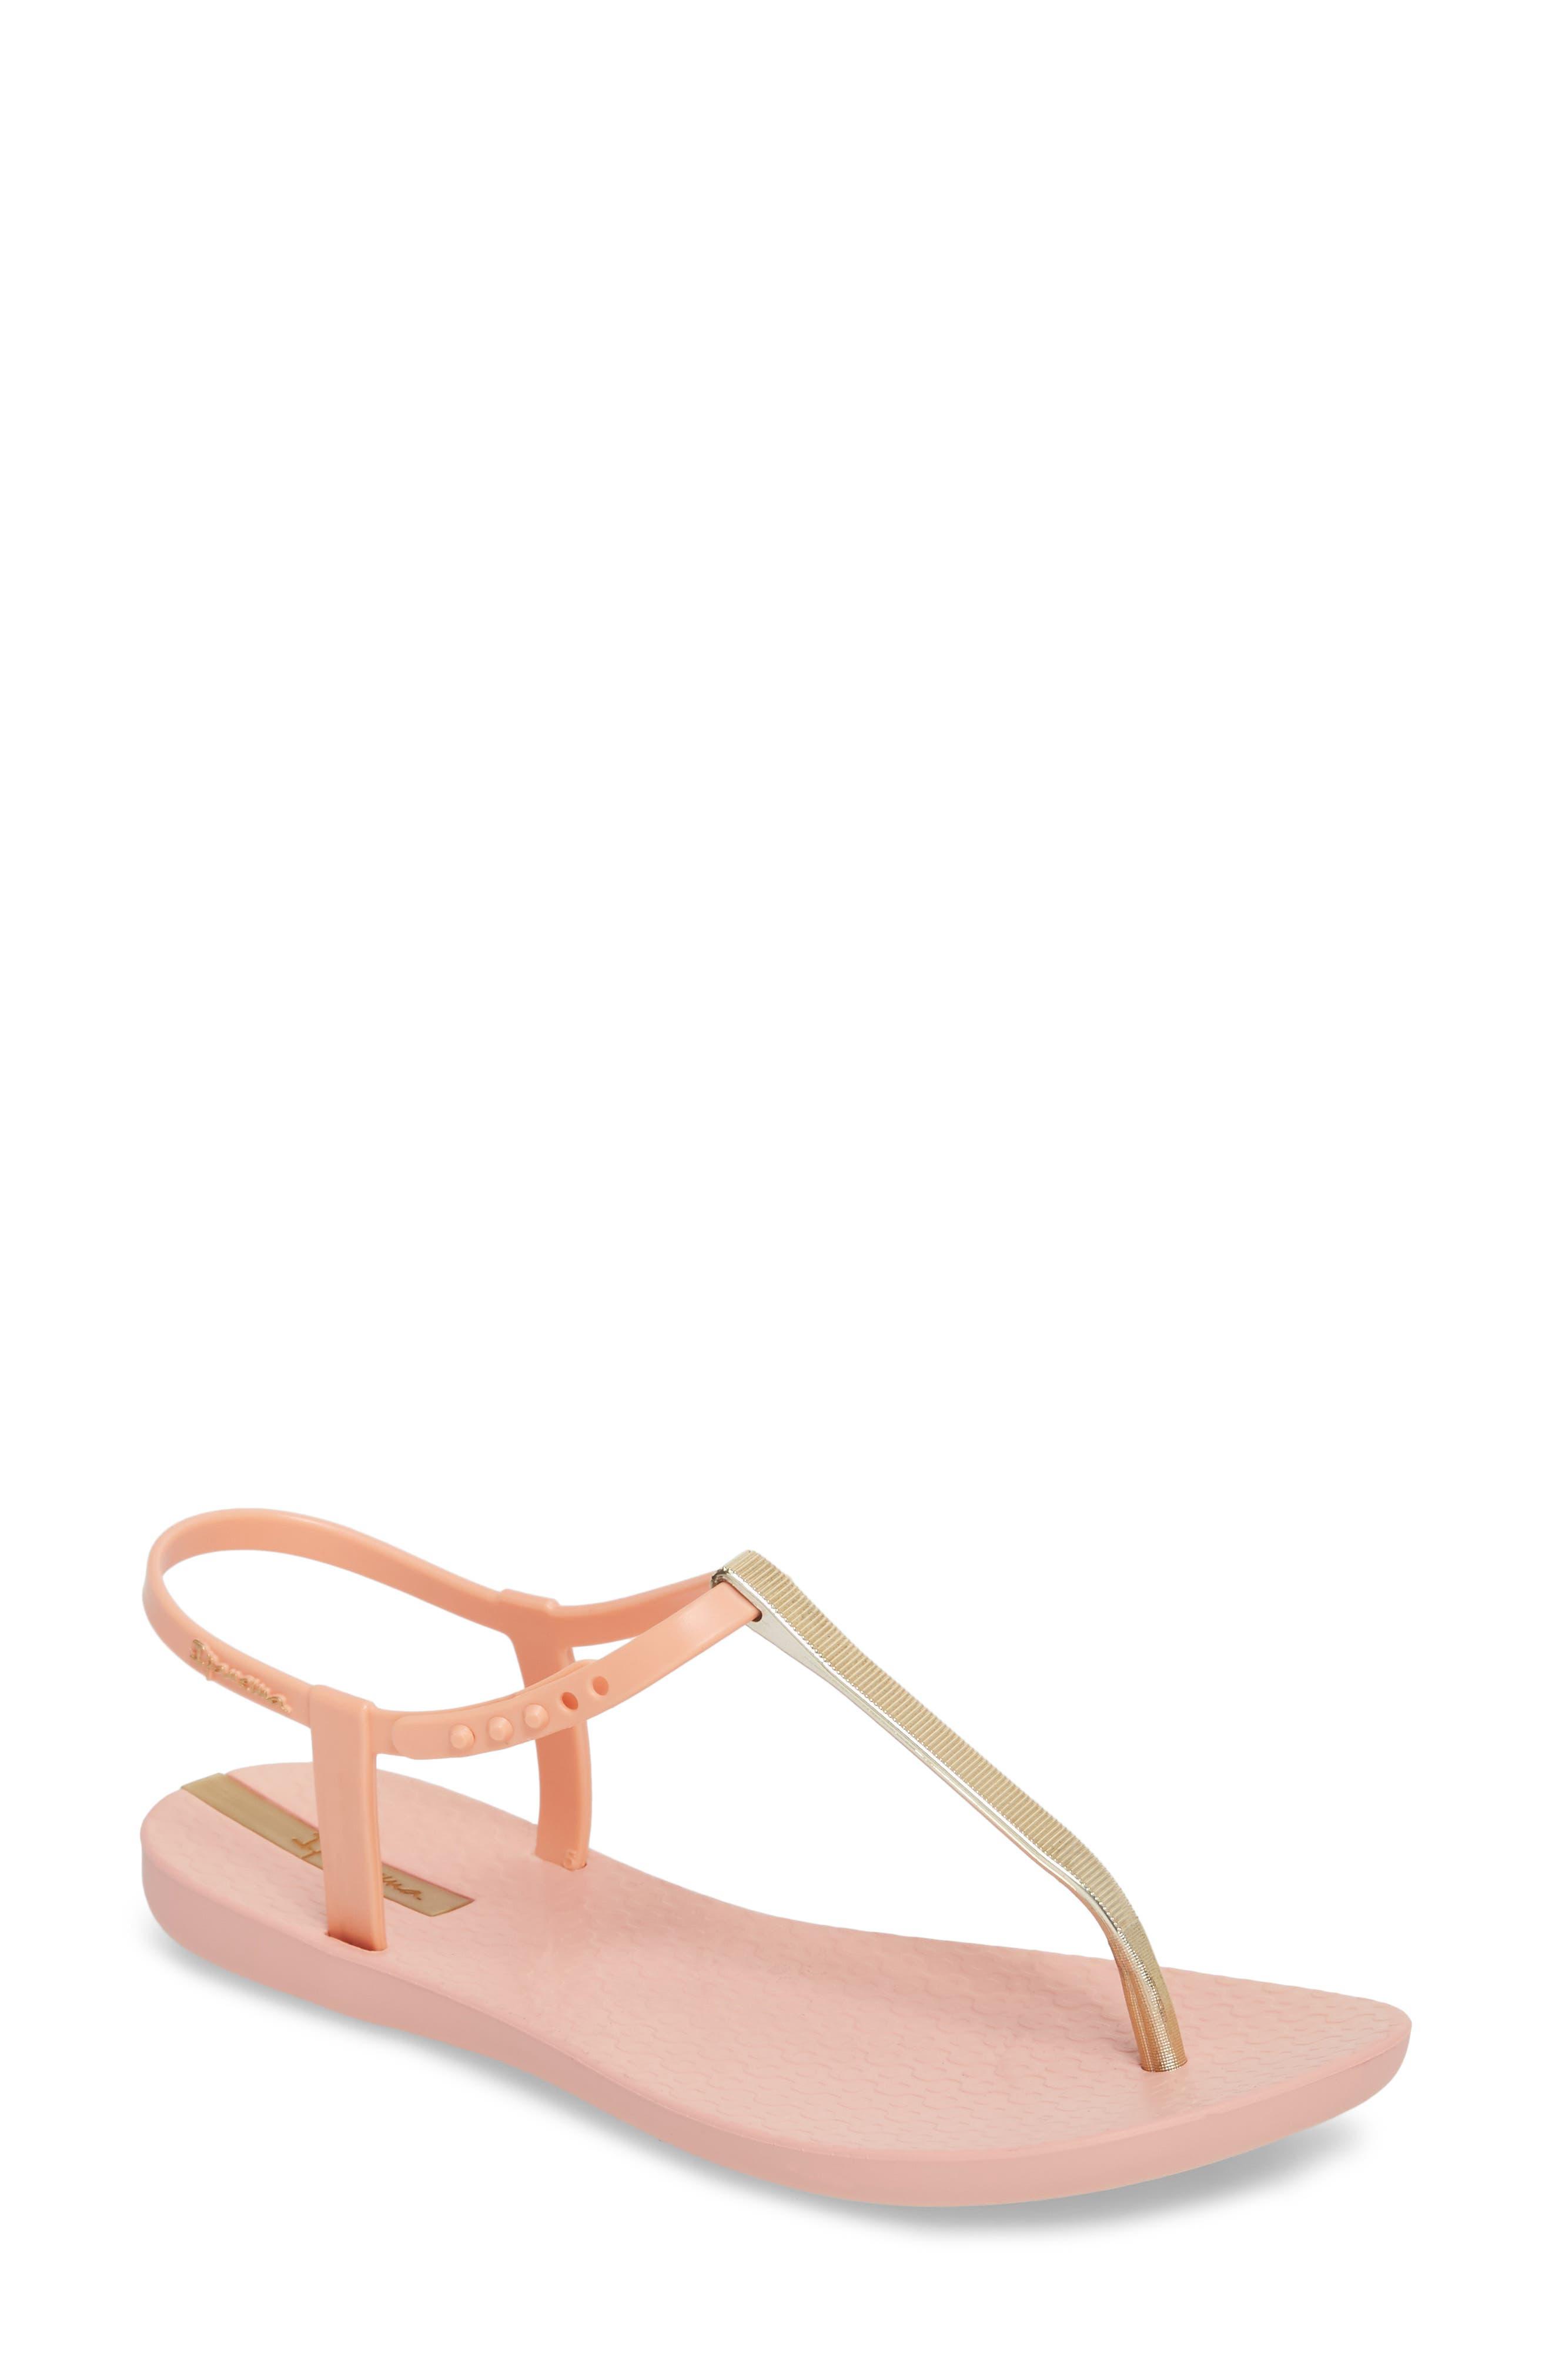 Bandeau Sandal,                             Main thumbnail 1, color,                             Pink/ Gold